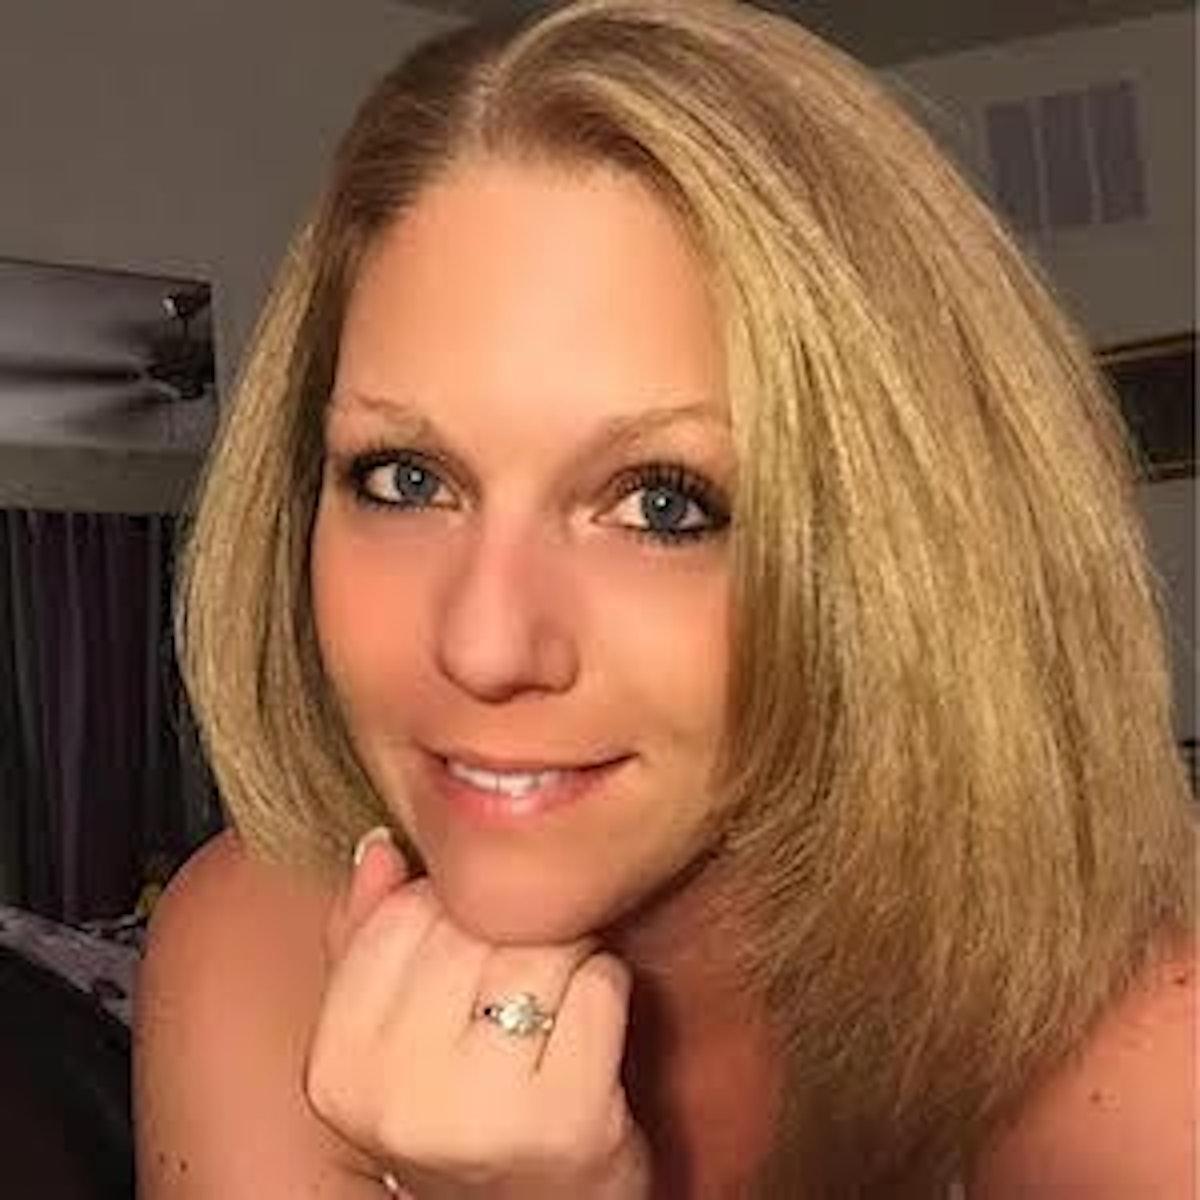 Jessica Faaborg